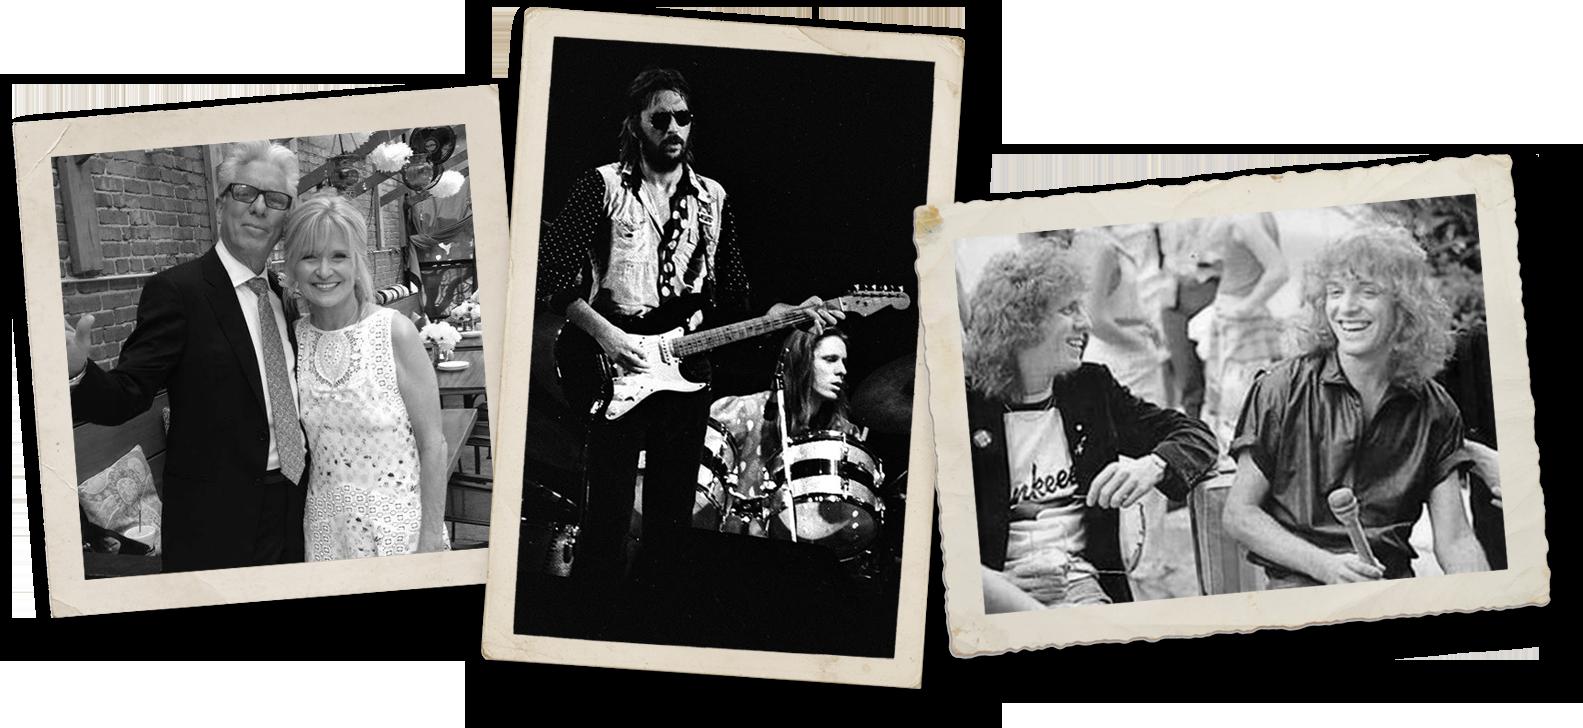 Jamie and Mary Oldaker | Eric Clapton and Jamie Oldaker | Jamie Oldaker and Peter Frampton